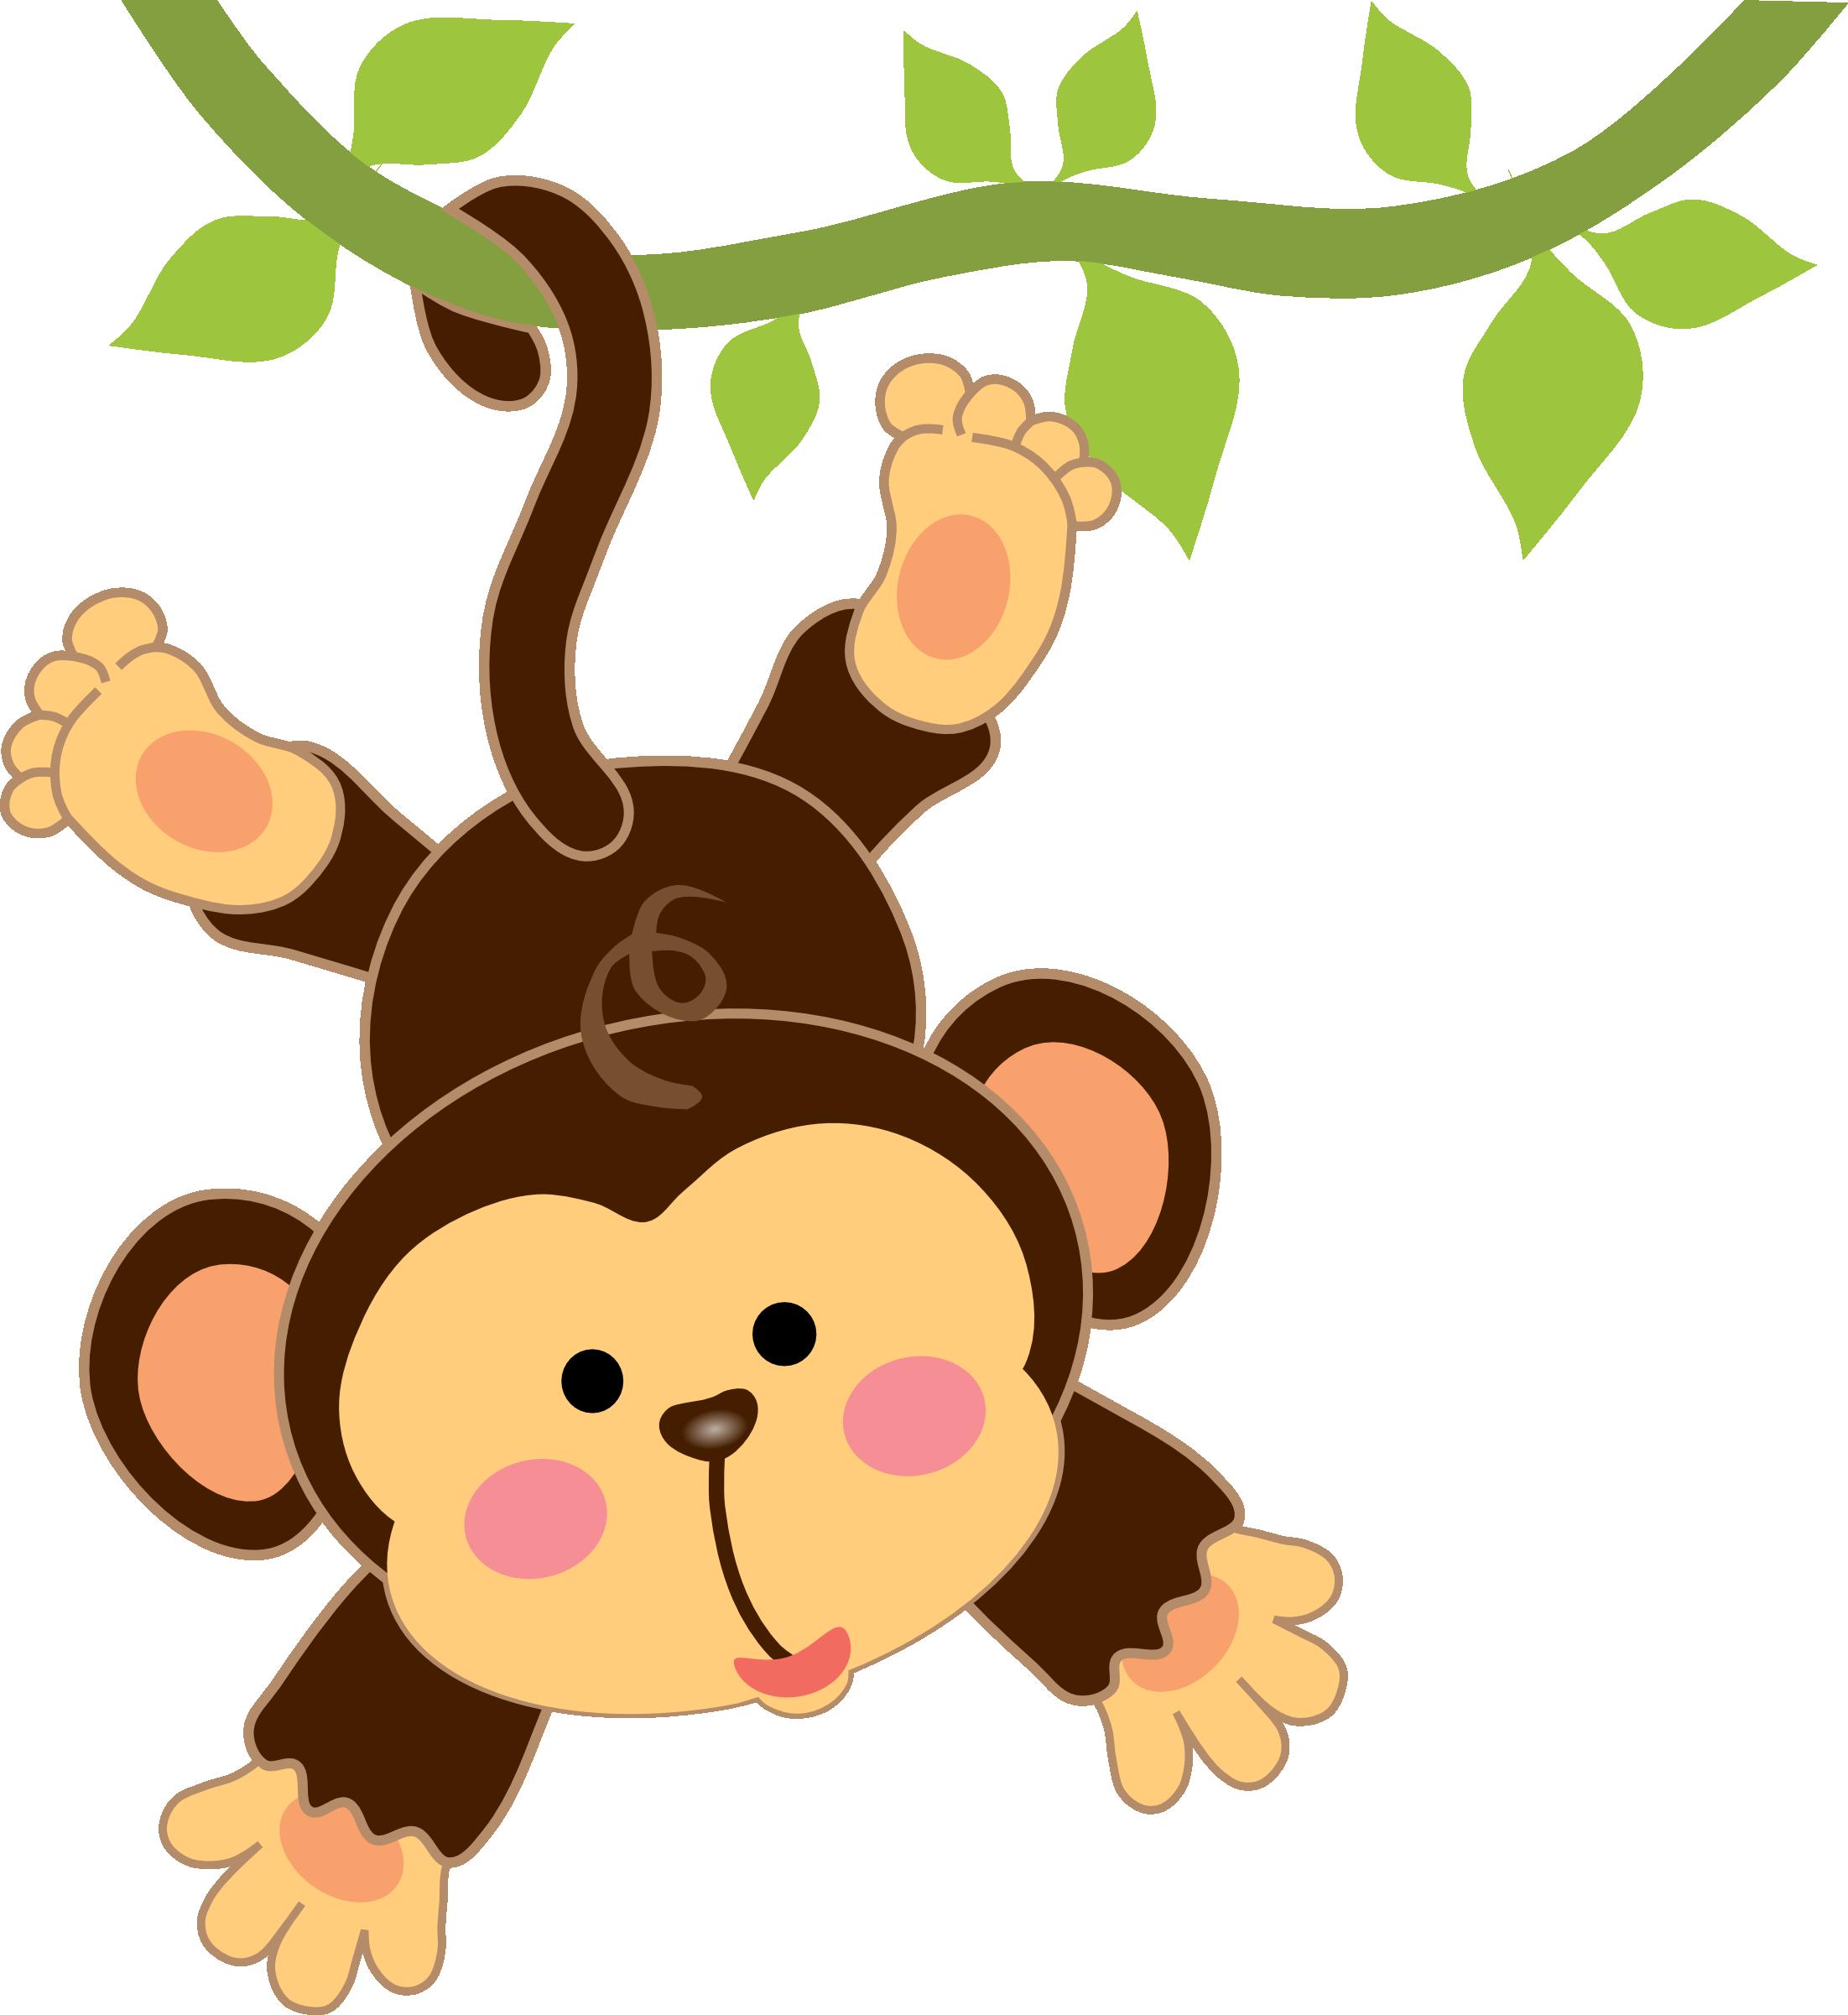 Free Safari Monkey Cliparts, Download Free Clip Art, Free.